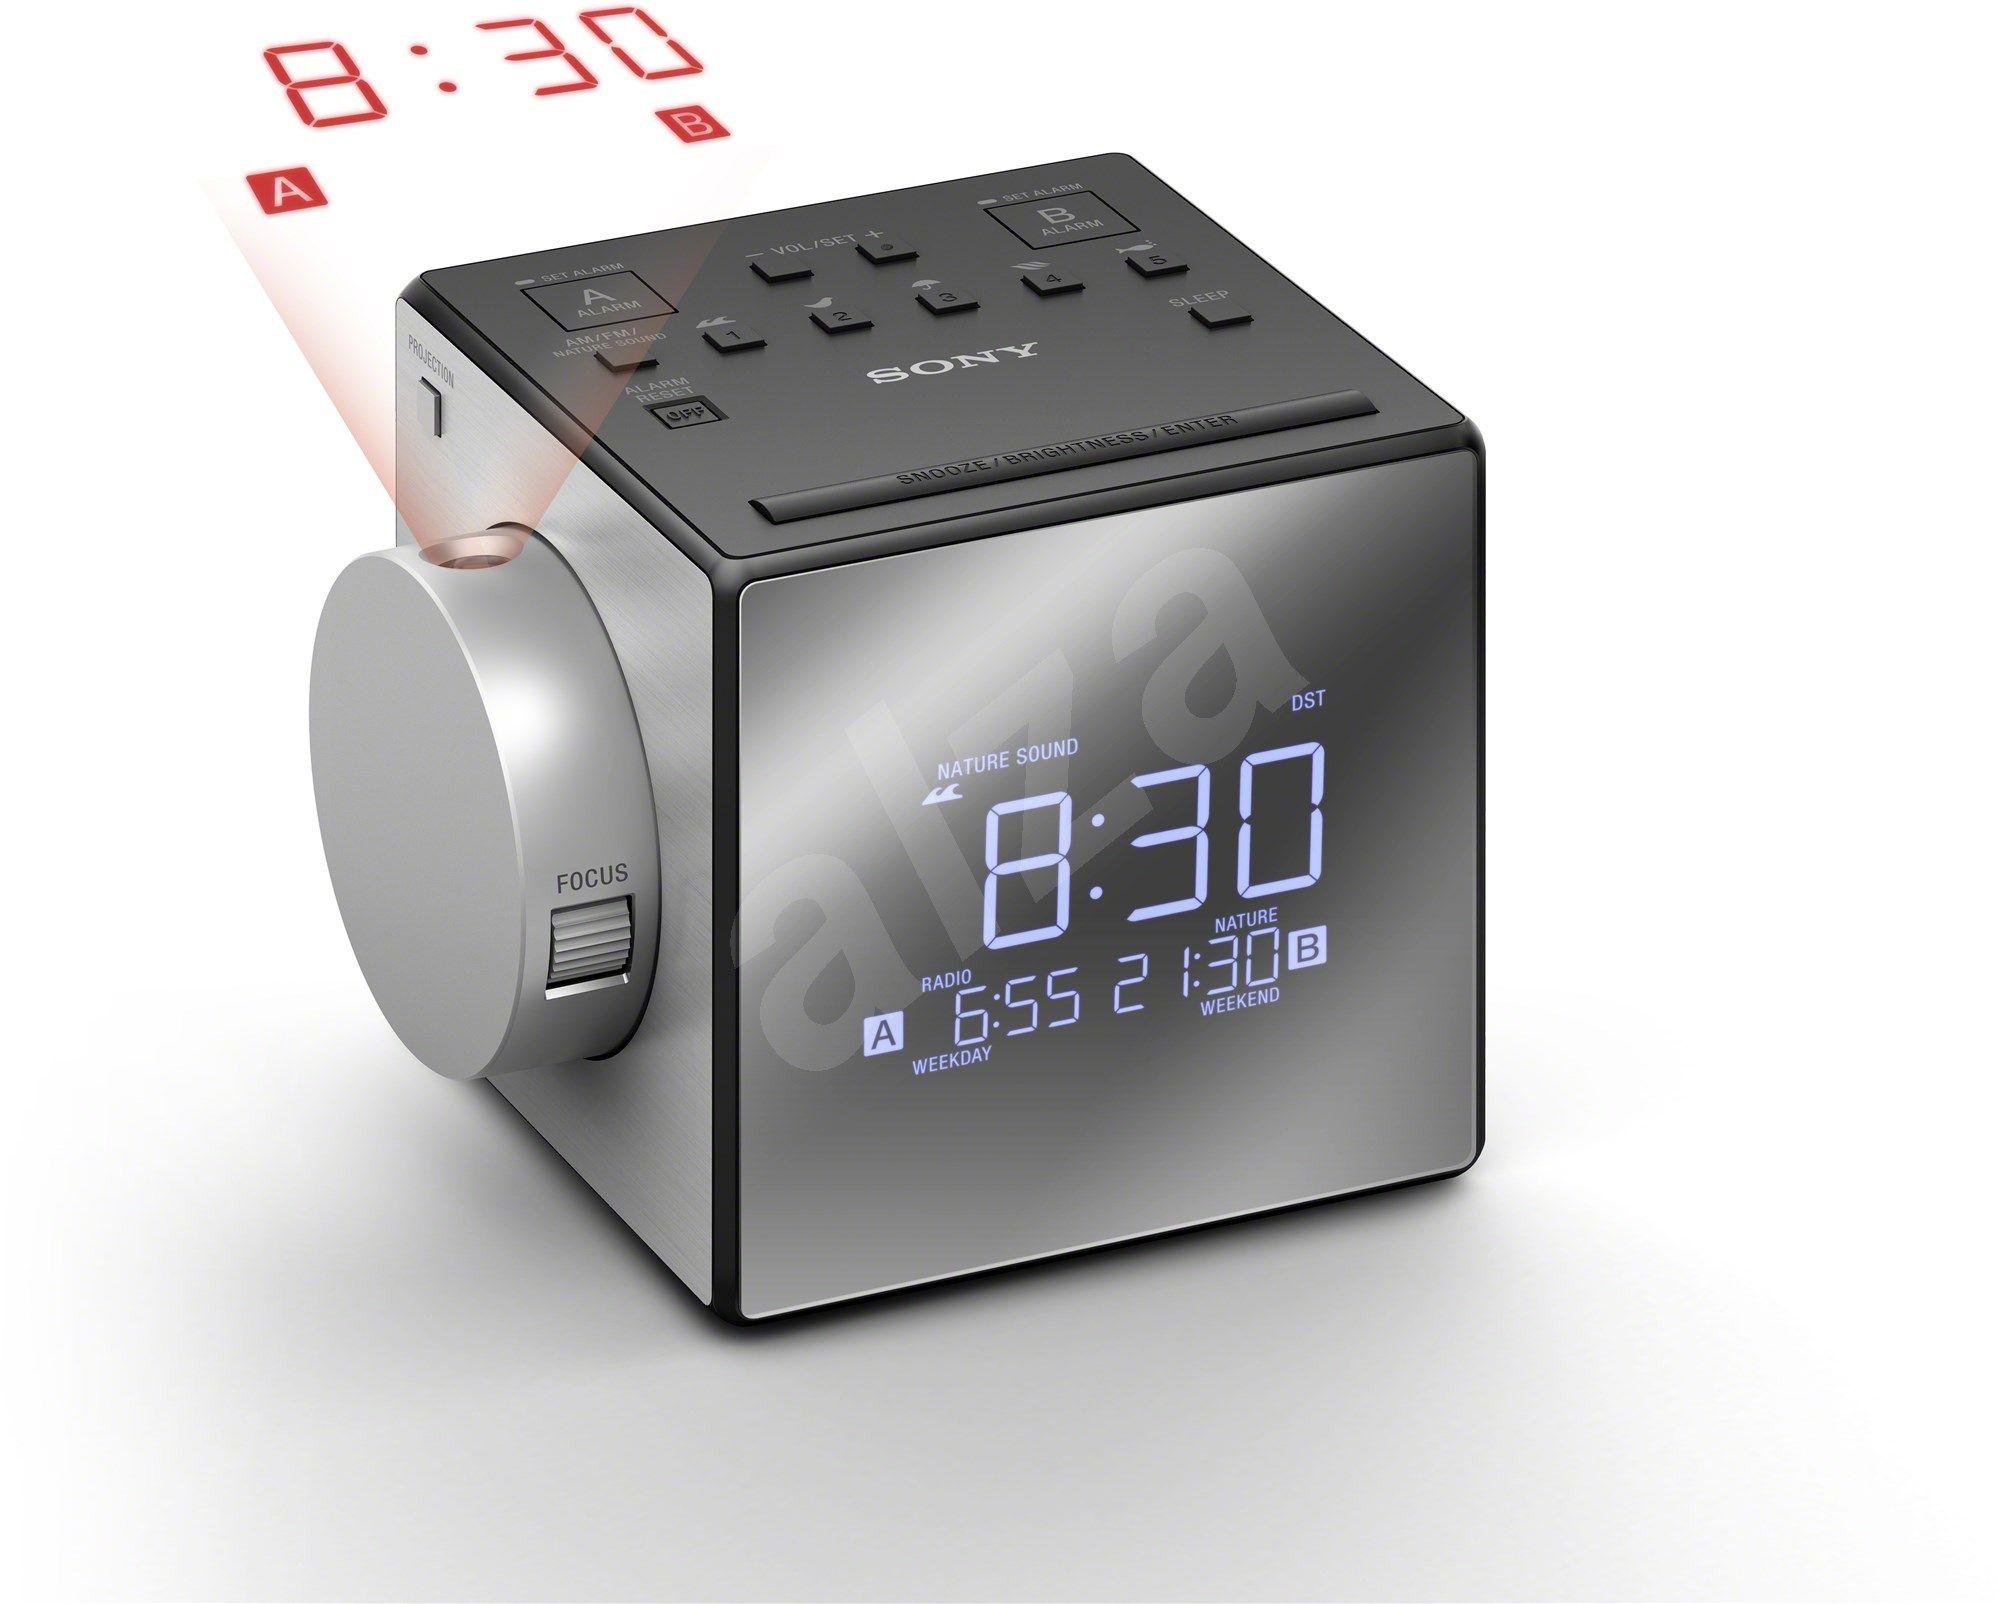 Sony Icf C1pj Radio Alarm Clock Alza Co Uk With Images